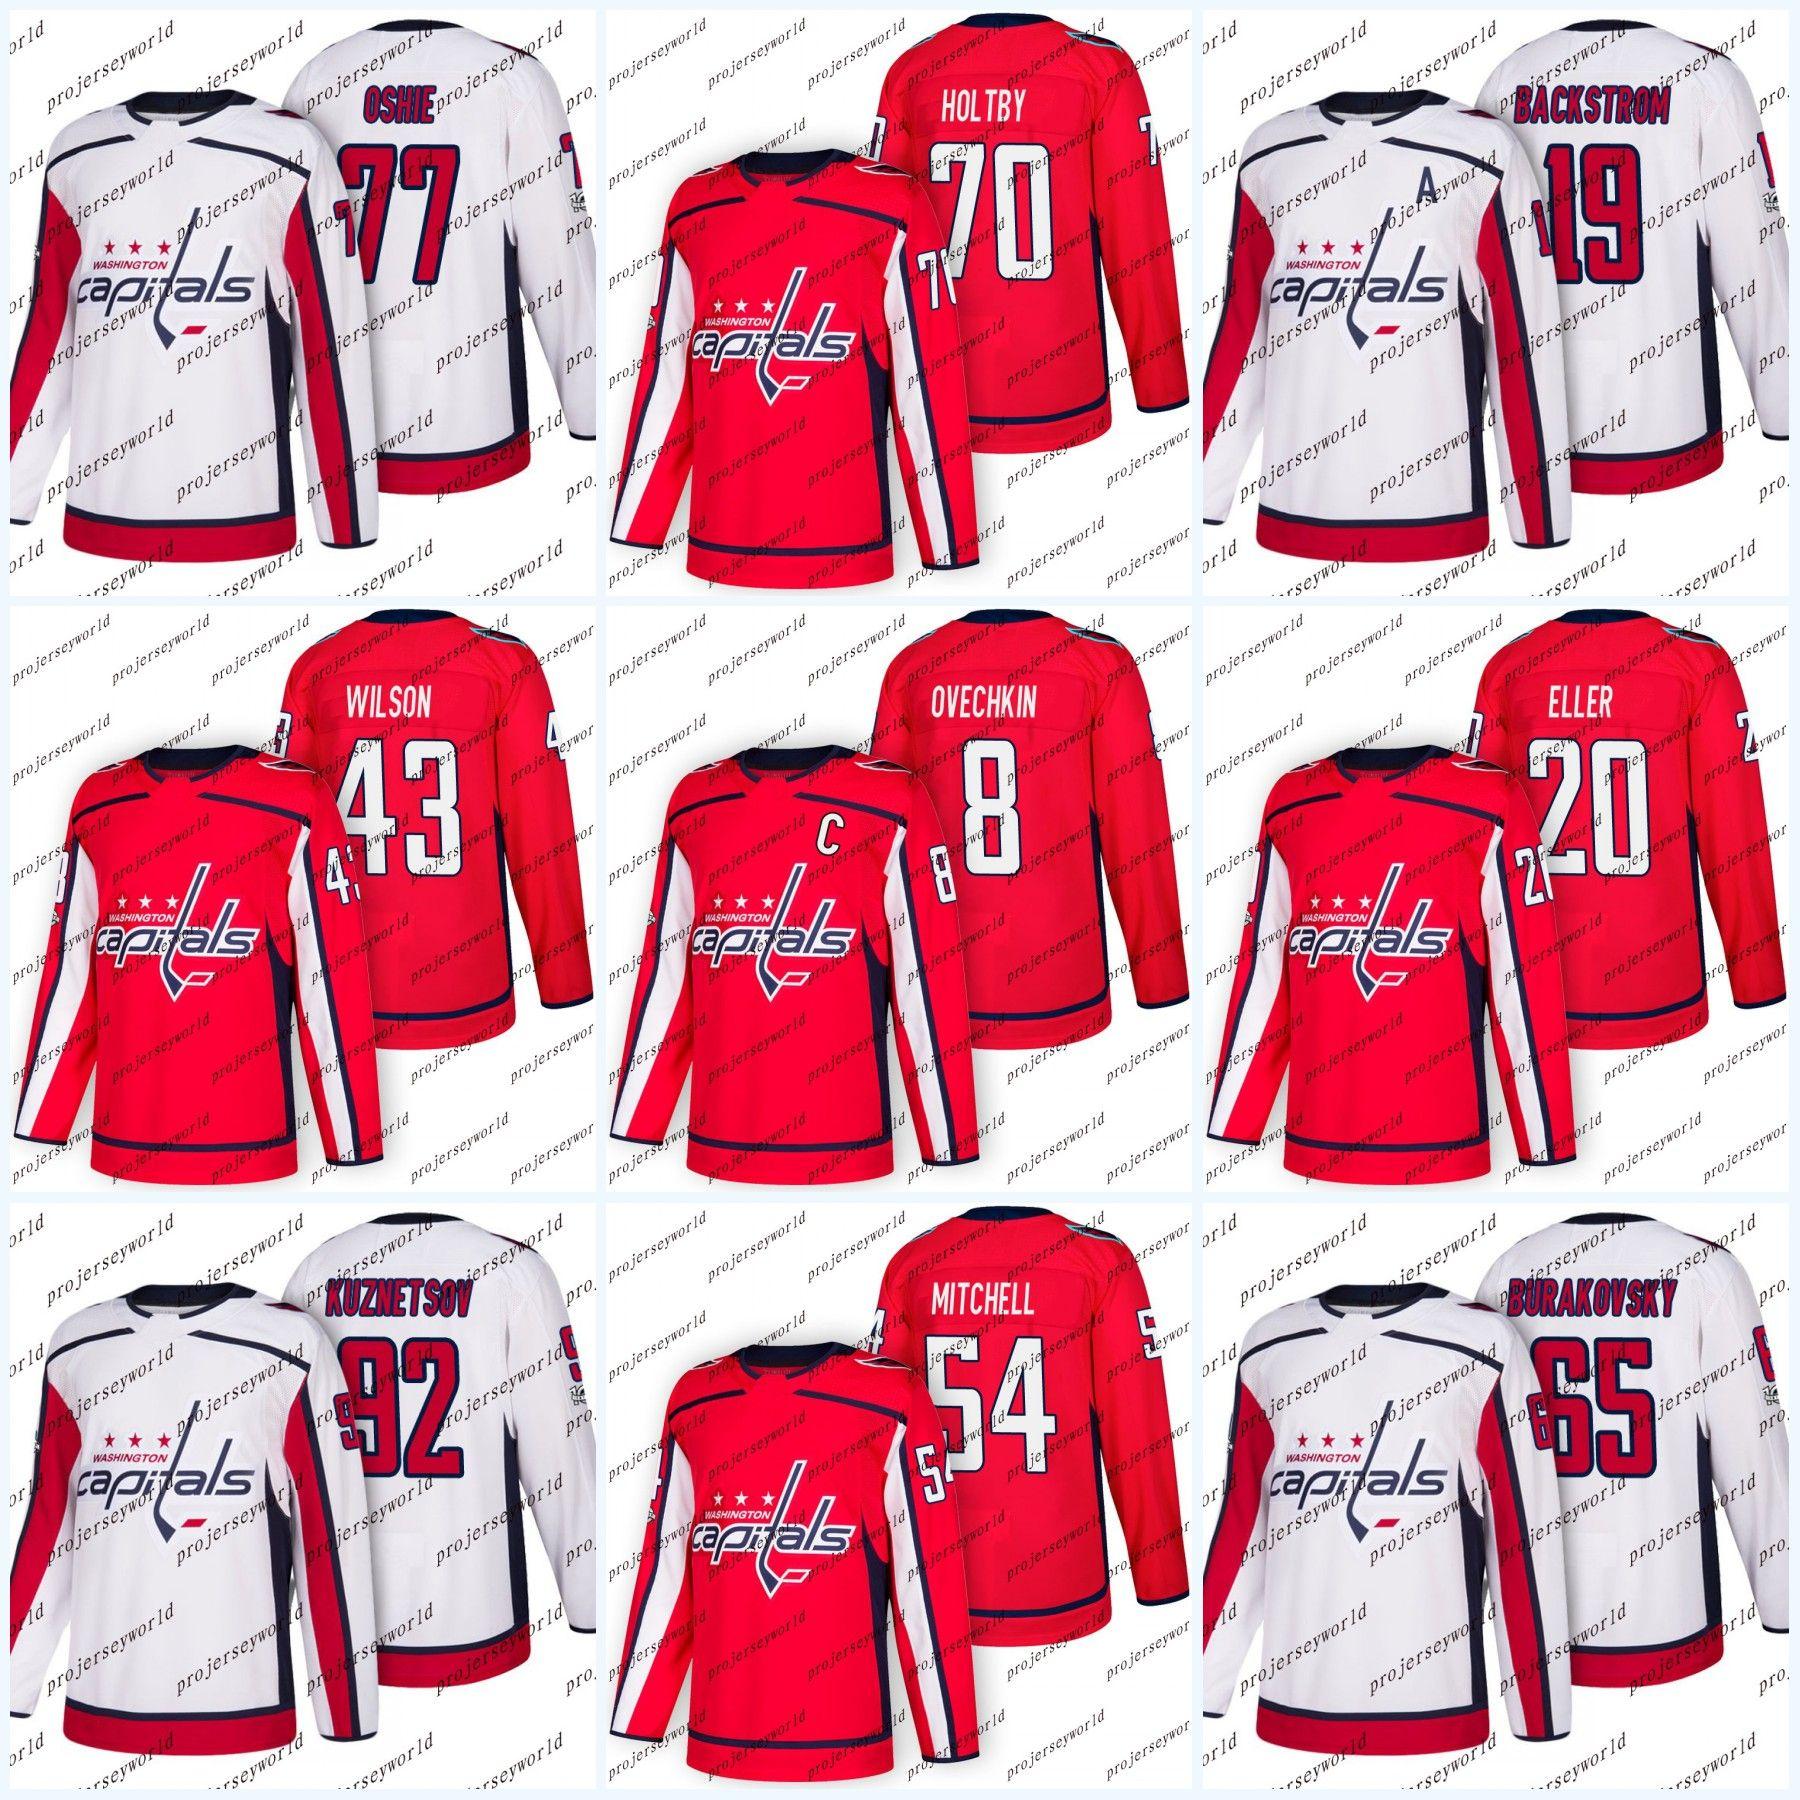 796e9bf72 Womens 100th Patch Washington Capitals Alex Ovechkin T.J. Oshie Evgeny  Kuznetsov Nicklas Backstrom Tom Wilson Team Road Ice Hockey Jerseys UK 2019  From ...